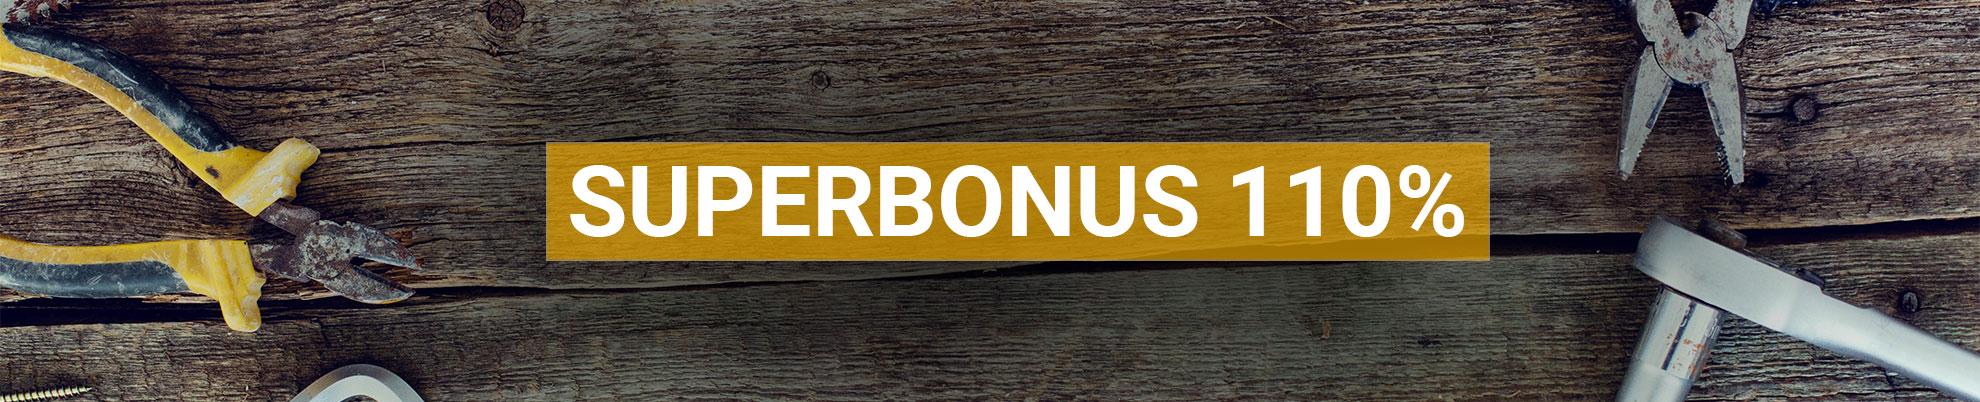 metroquadro-superbonus